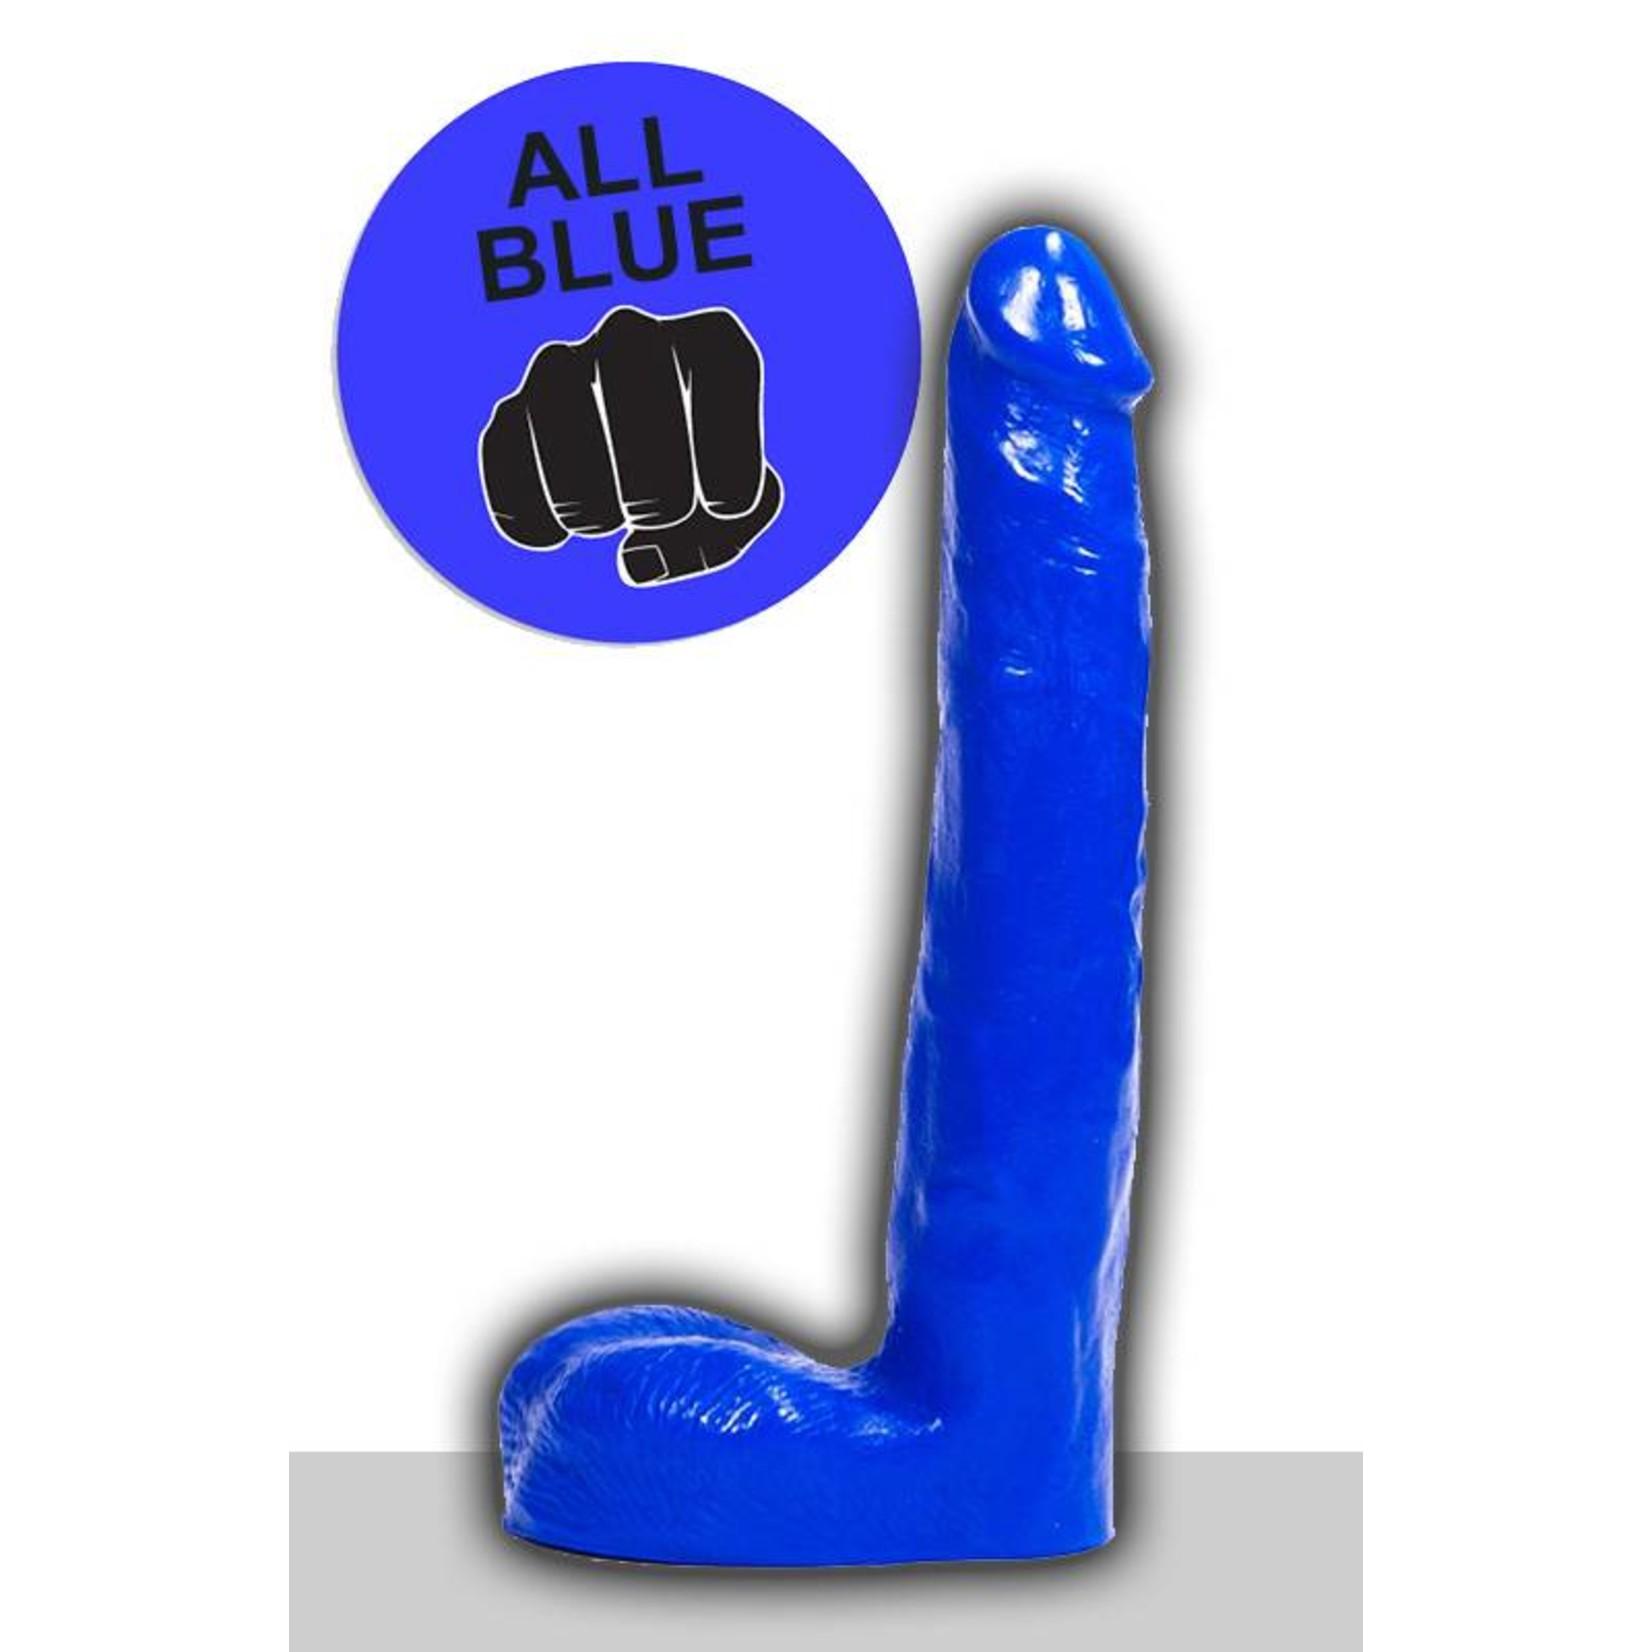 All Black All Blue Dildo - ABB 04